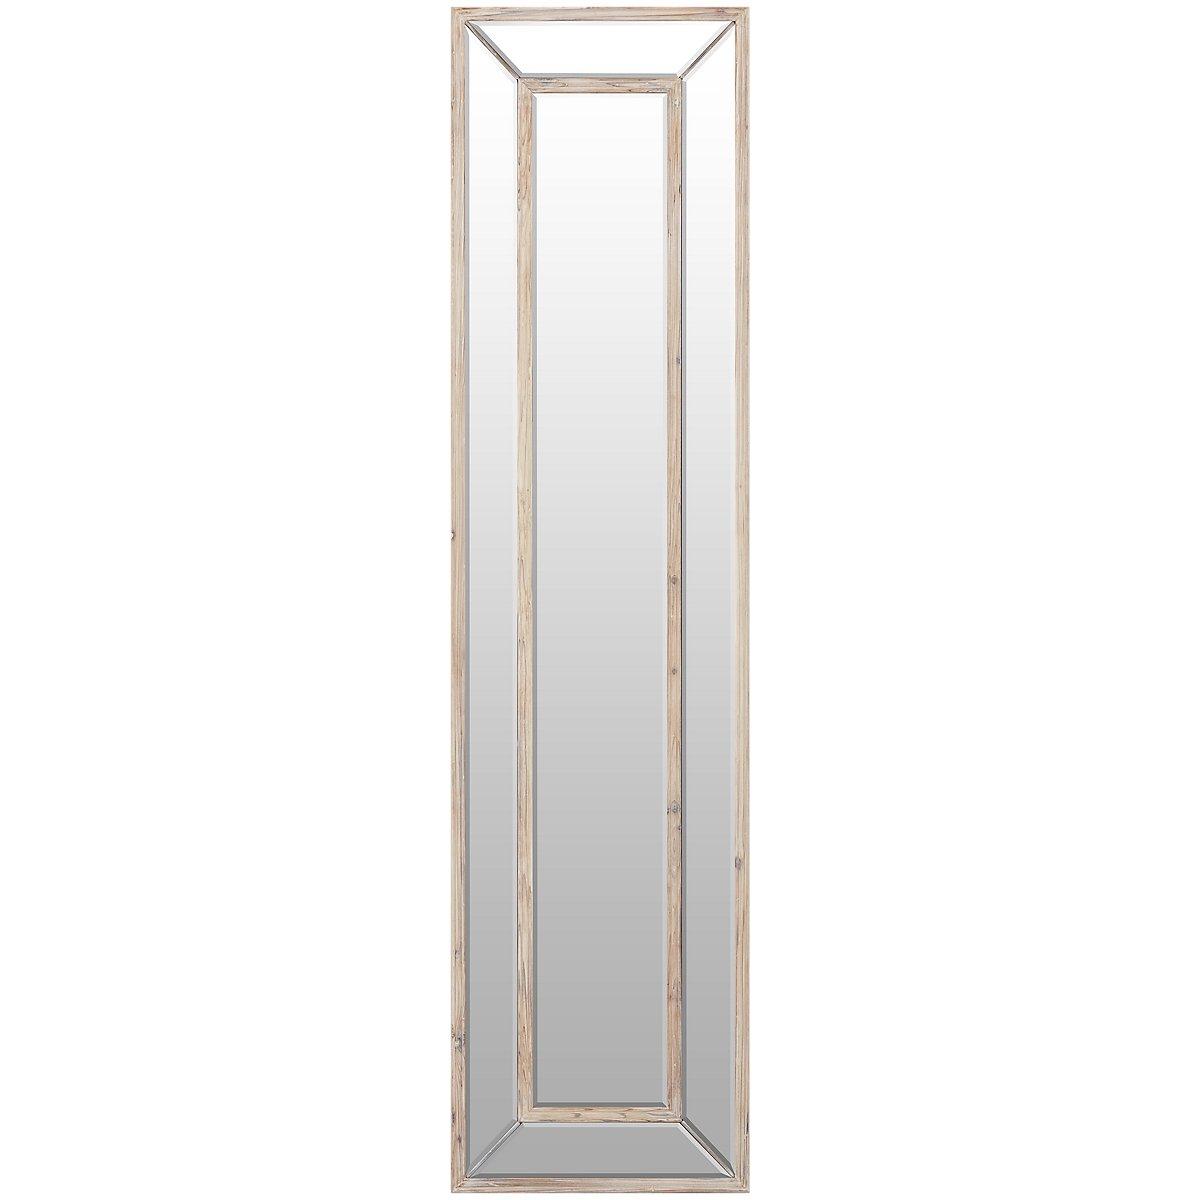 City furniture pompano dark gold floor mirror for Gold floor standing mirror